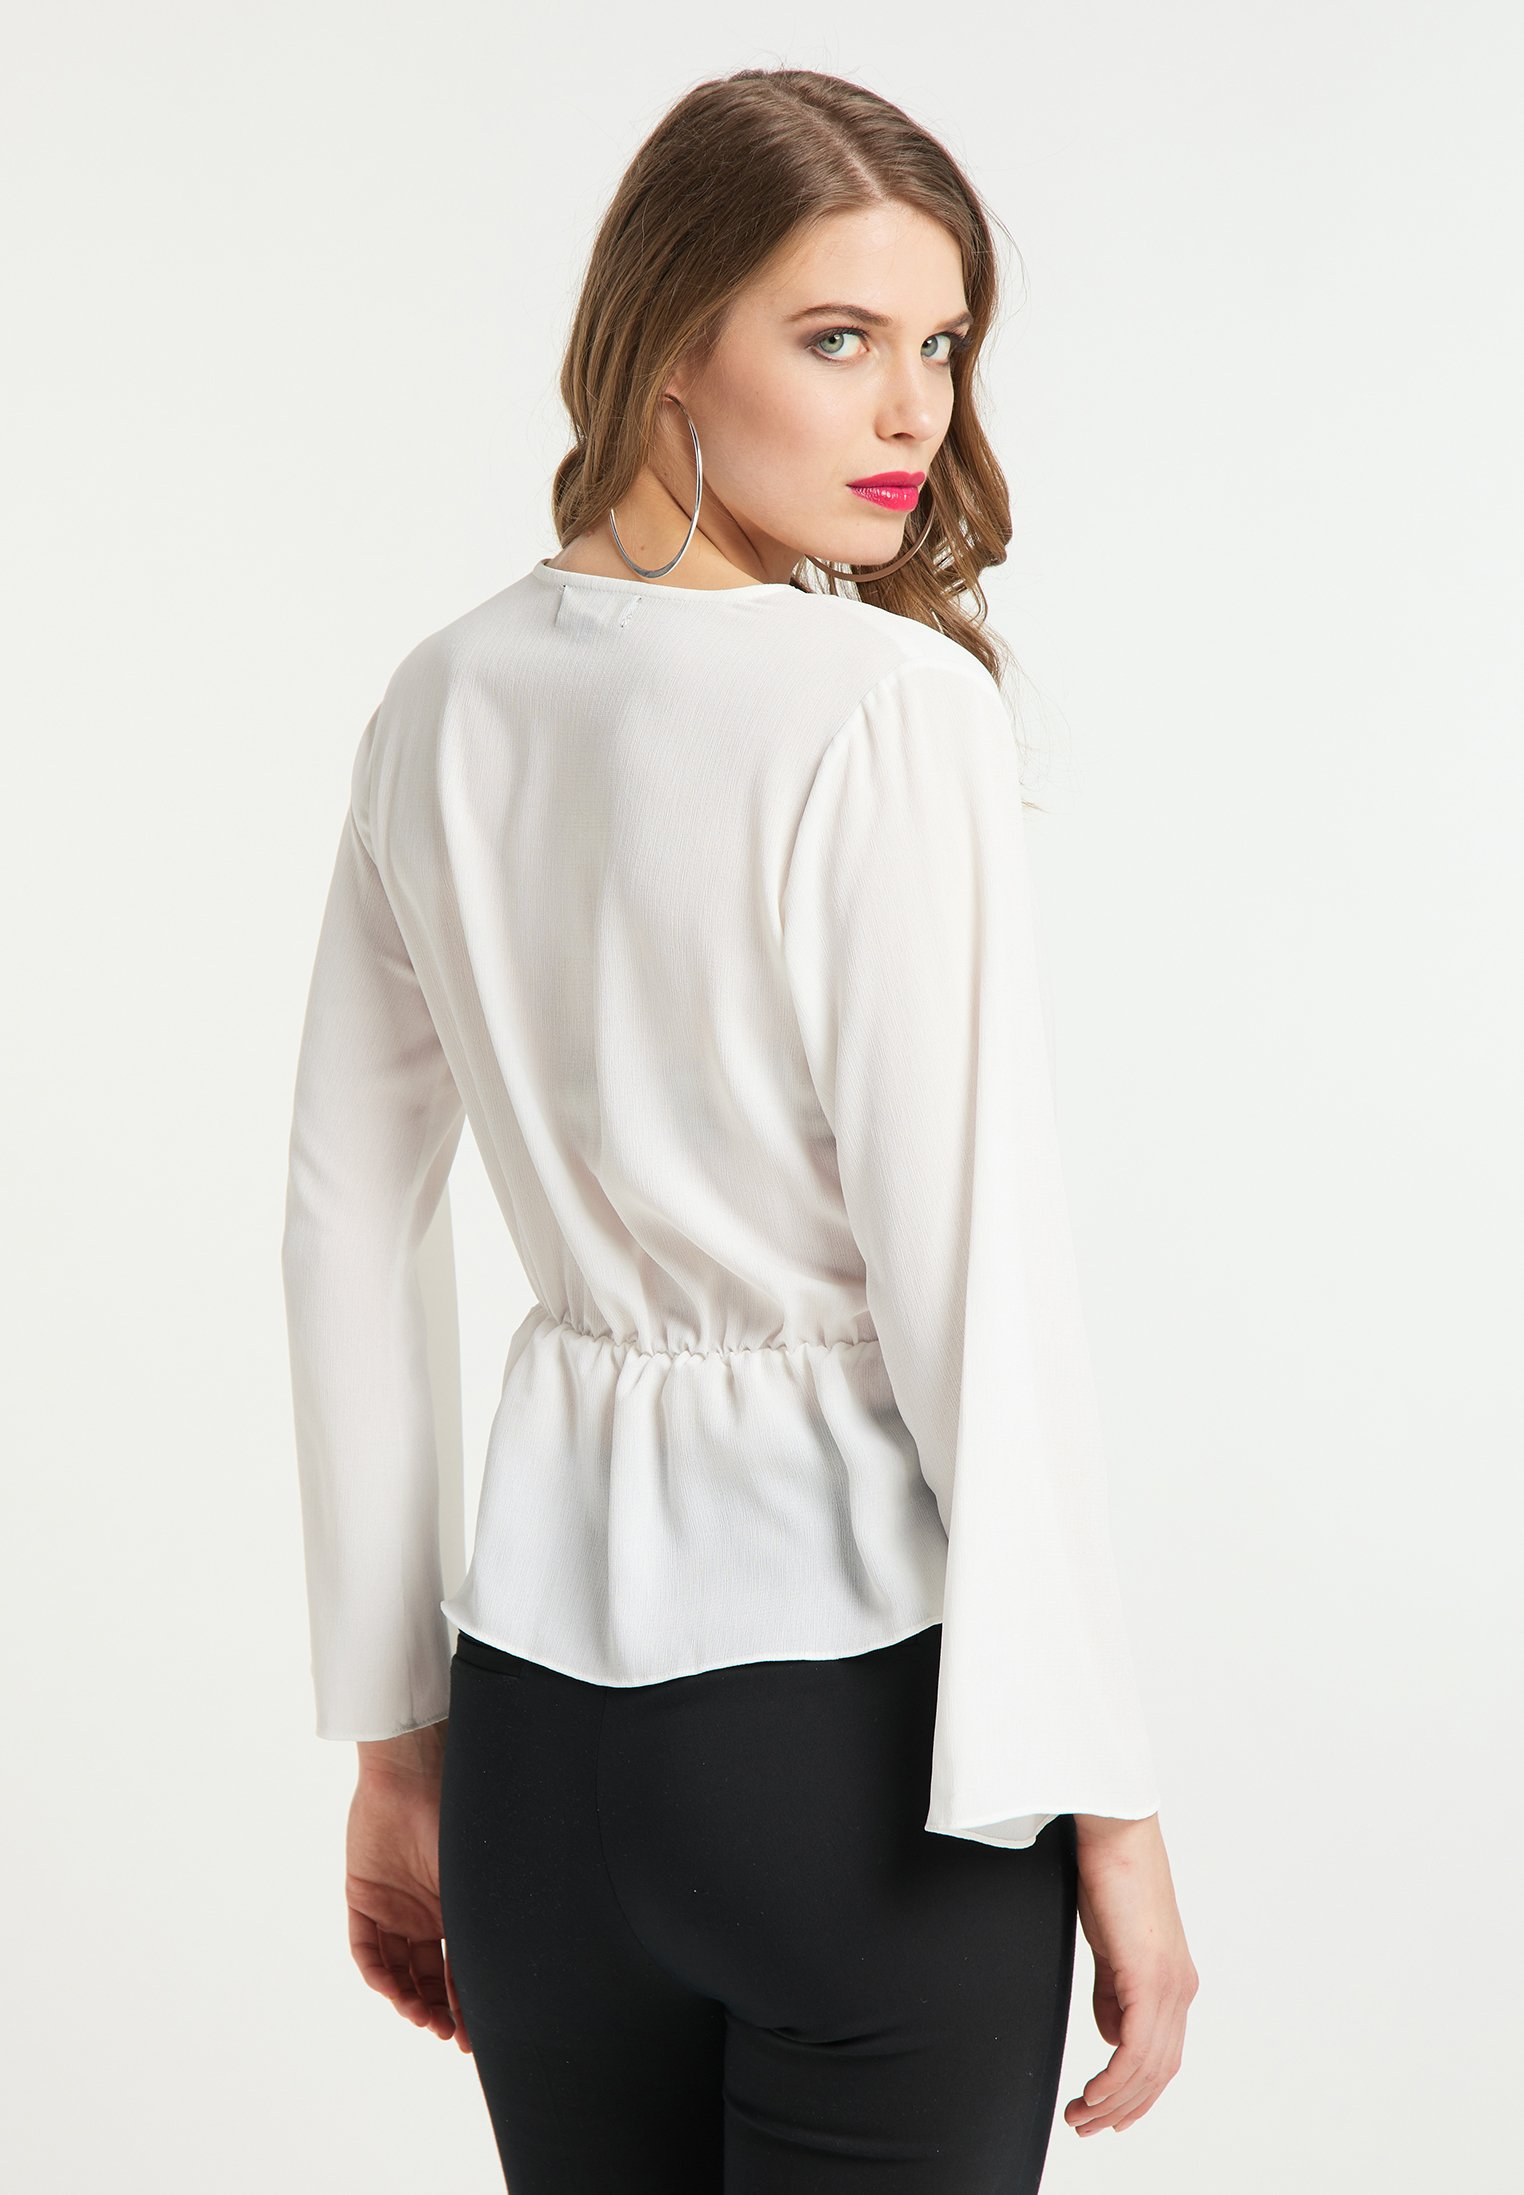 Huge Surprise Women's Clothing faina Blouse weiss LnIOmAkxX